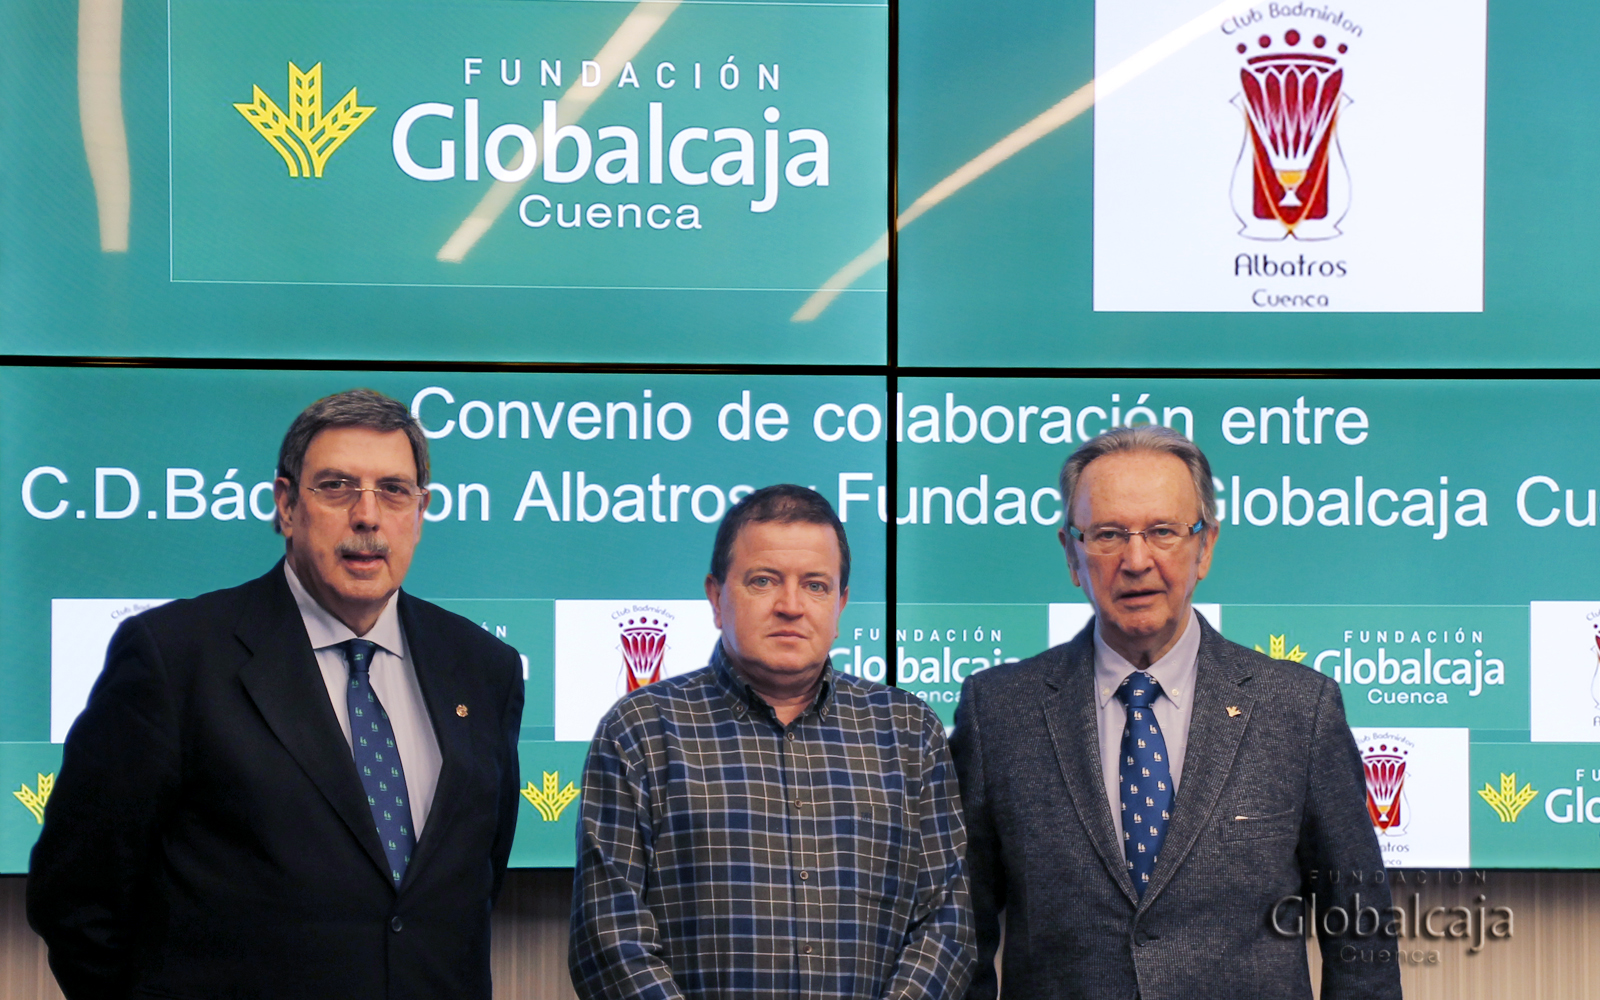 https://blog.globalcaja.es/wp-content/uploads/2018/05/convenio-badminton.jpg